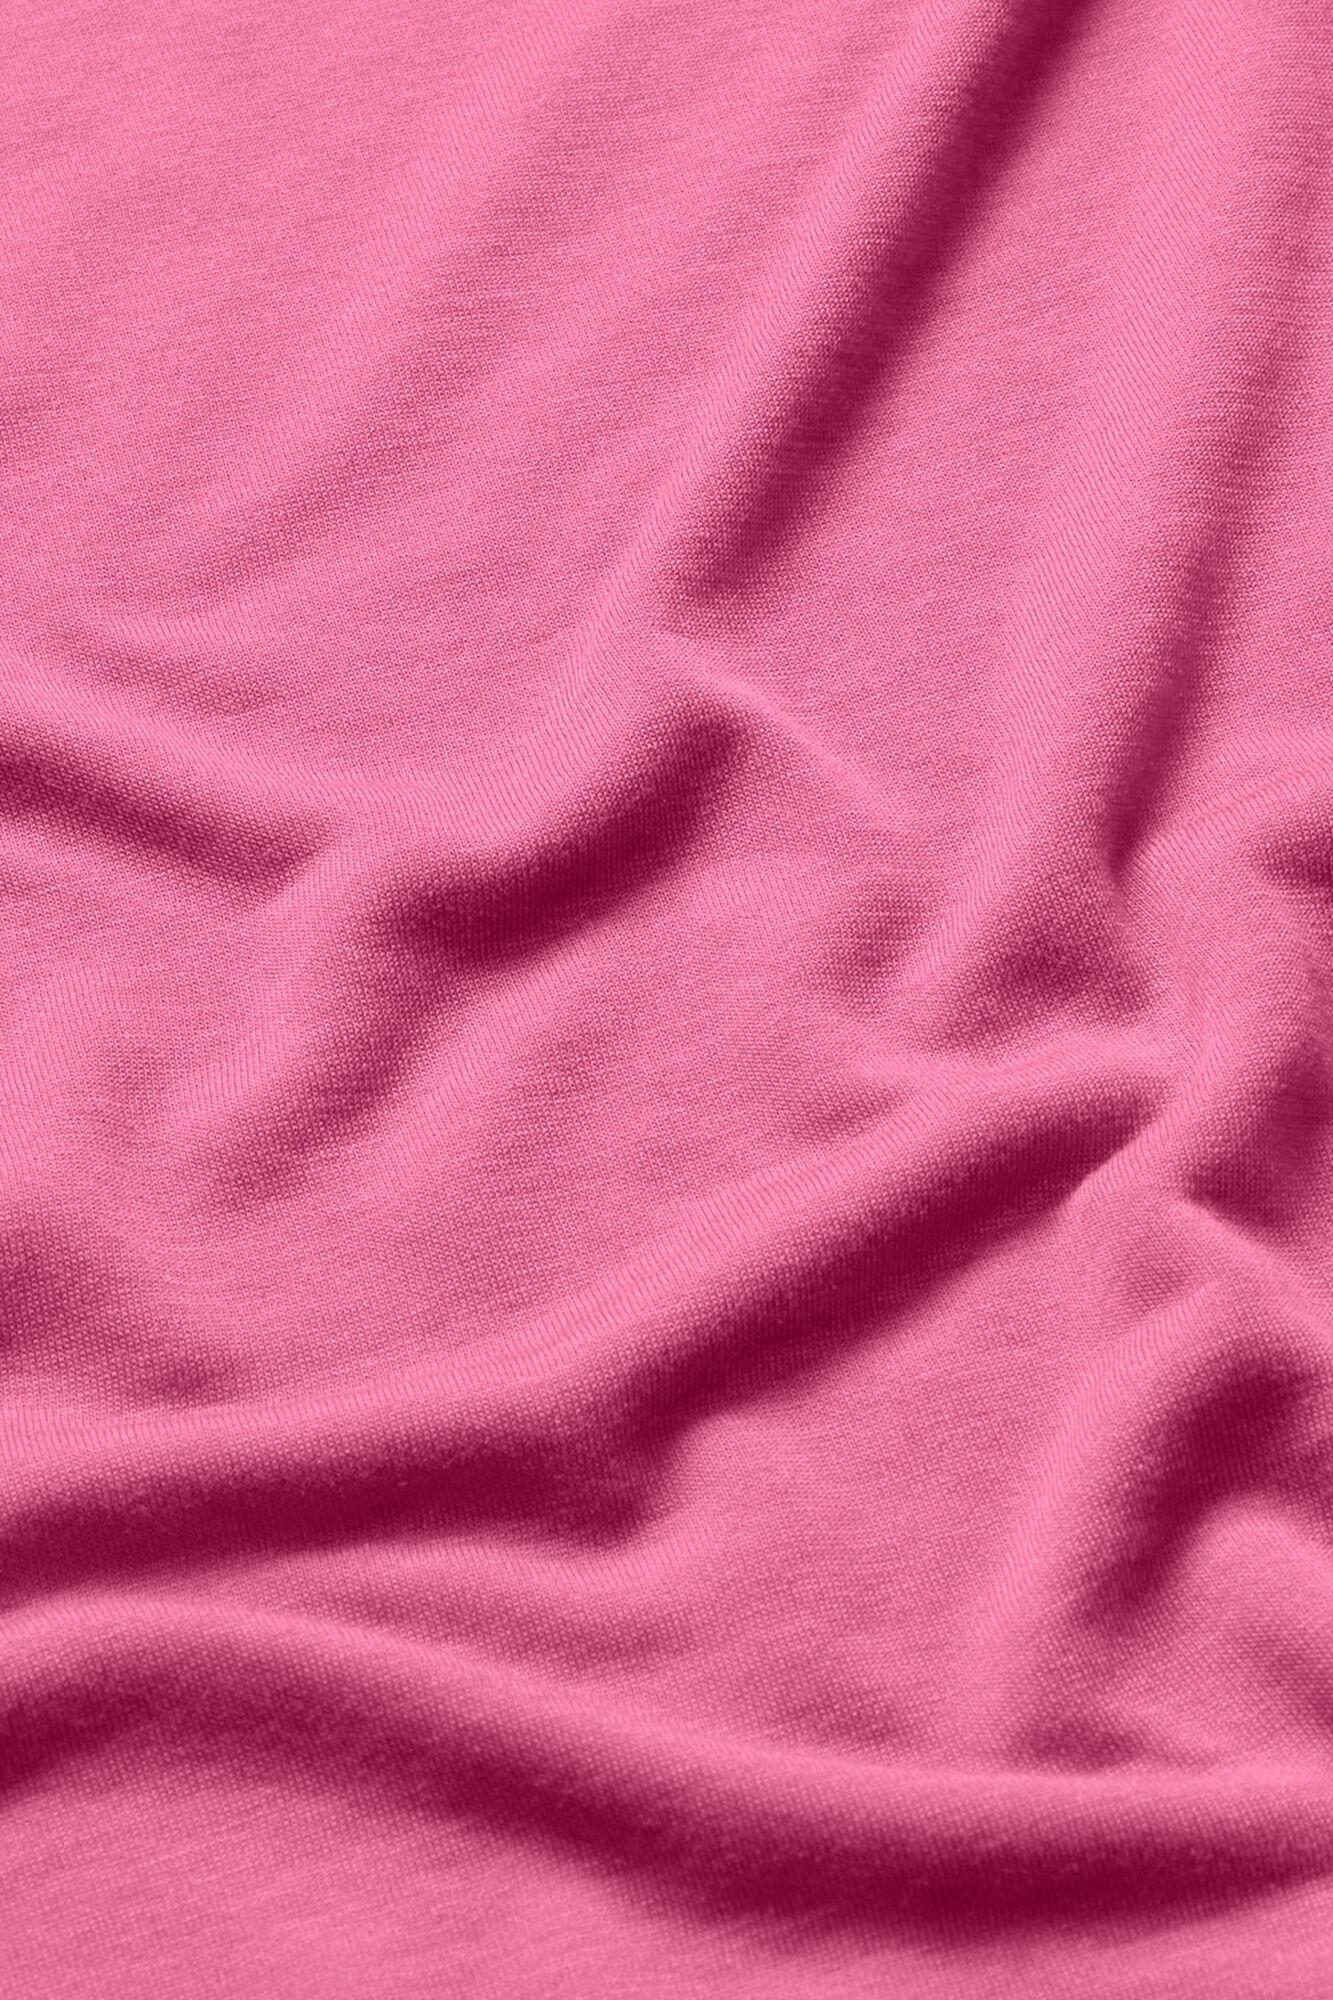 AMEGA SCARF, Azalea Pink, hi-res